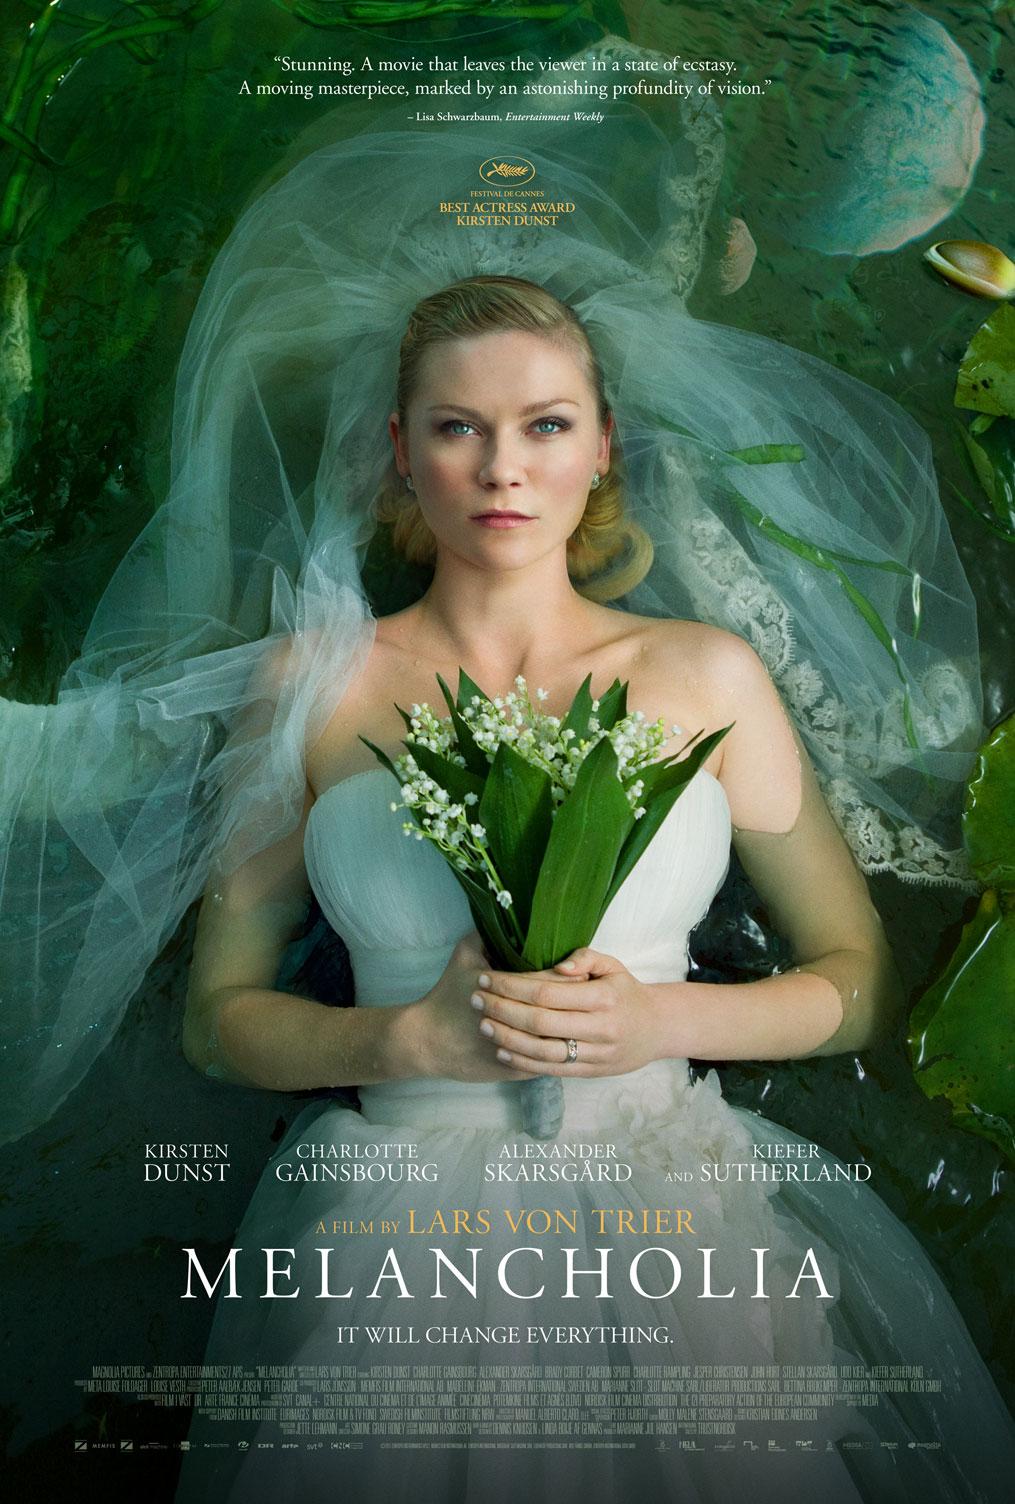 melancholia-movie-poster.jpg